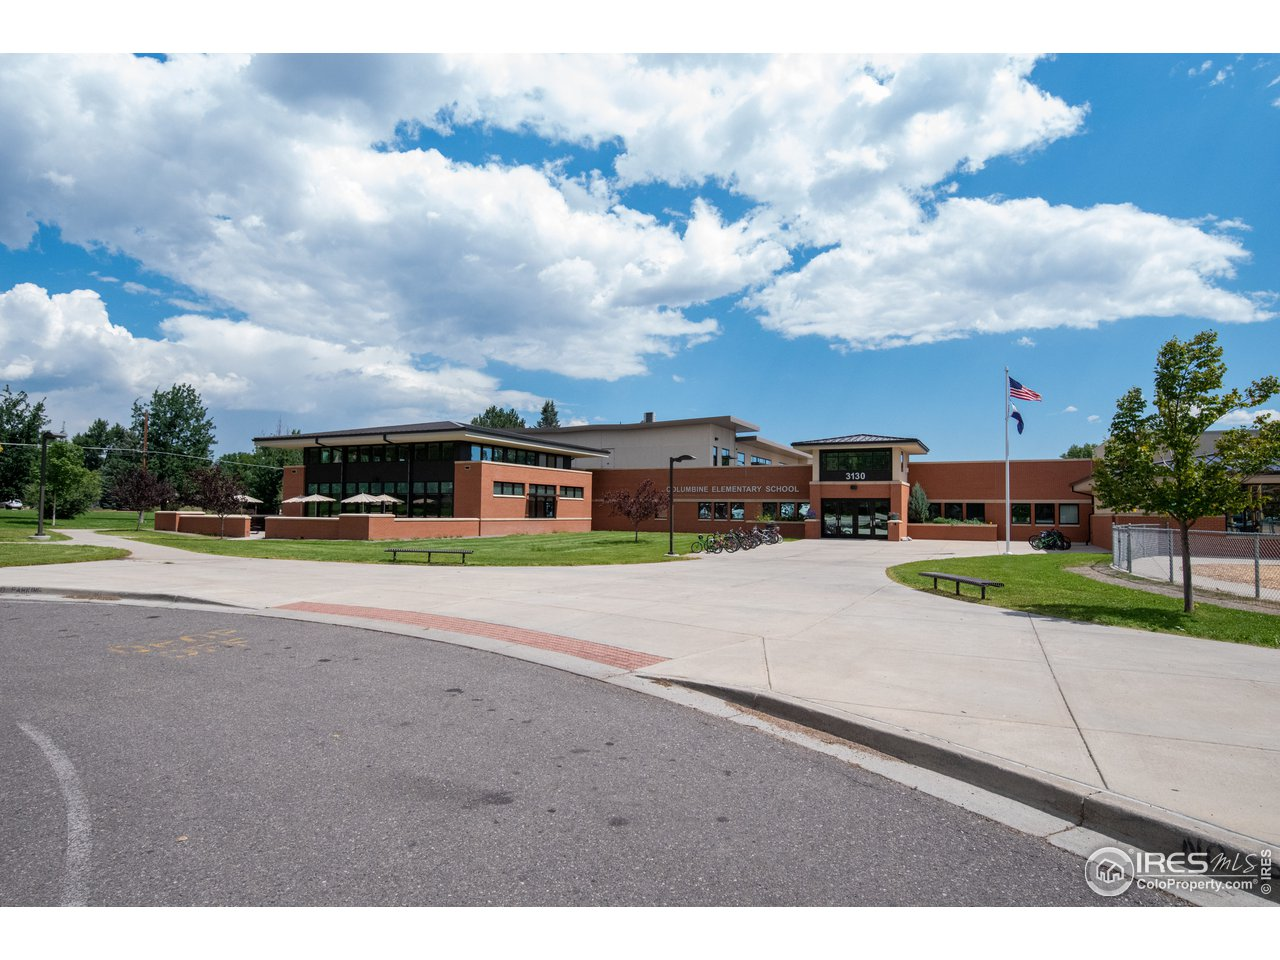 Close to Columbine Elementary School